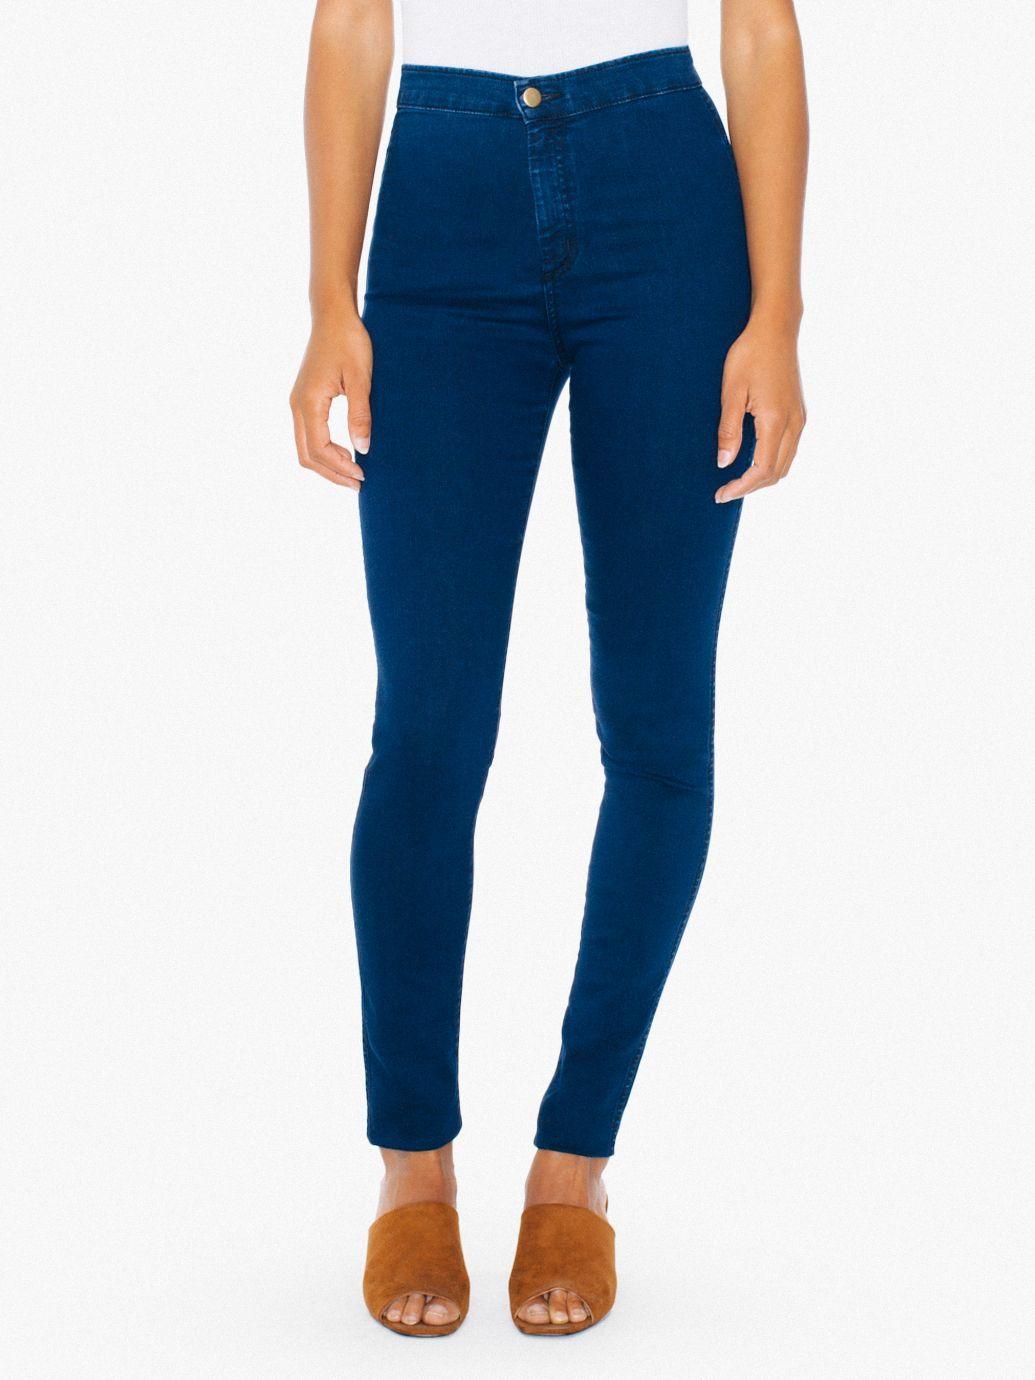 White high waist easy jeans